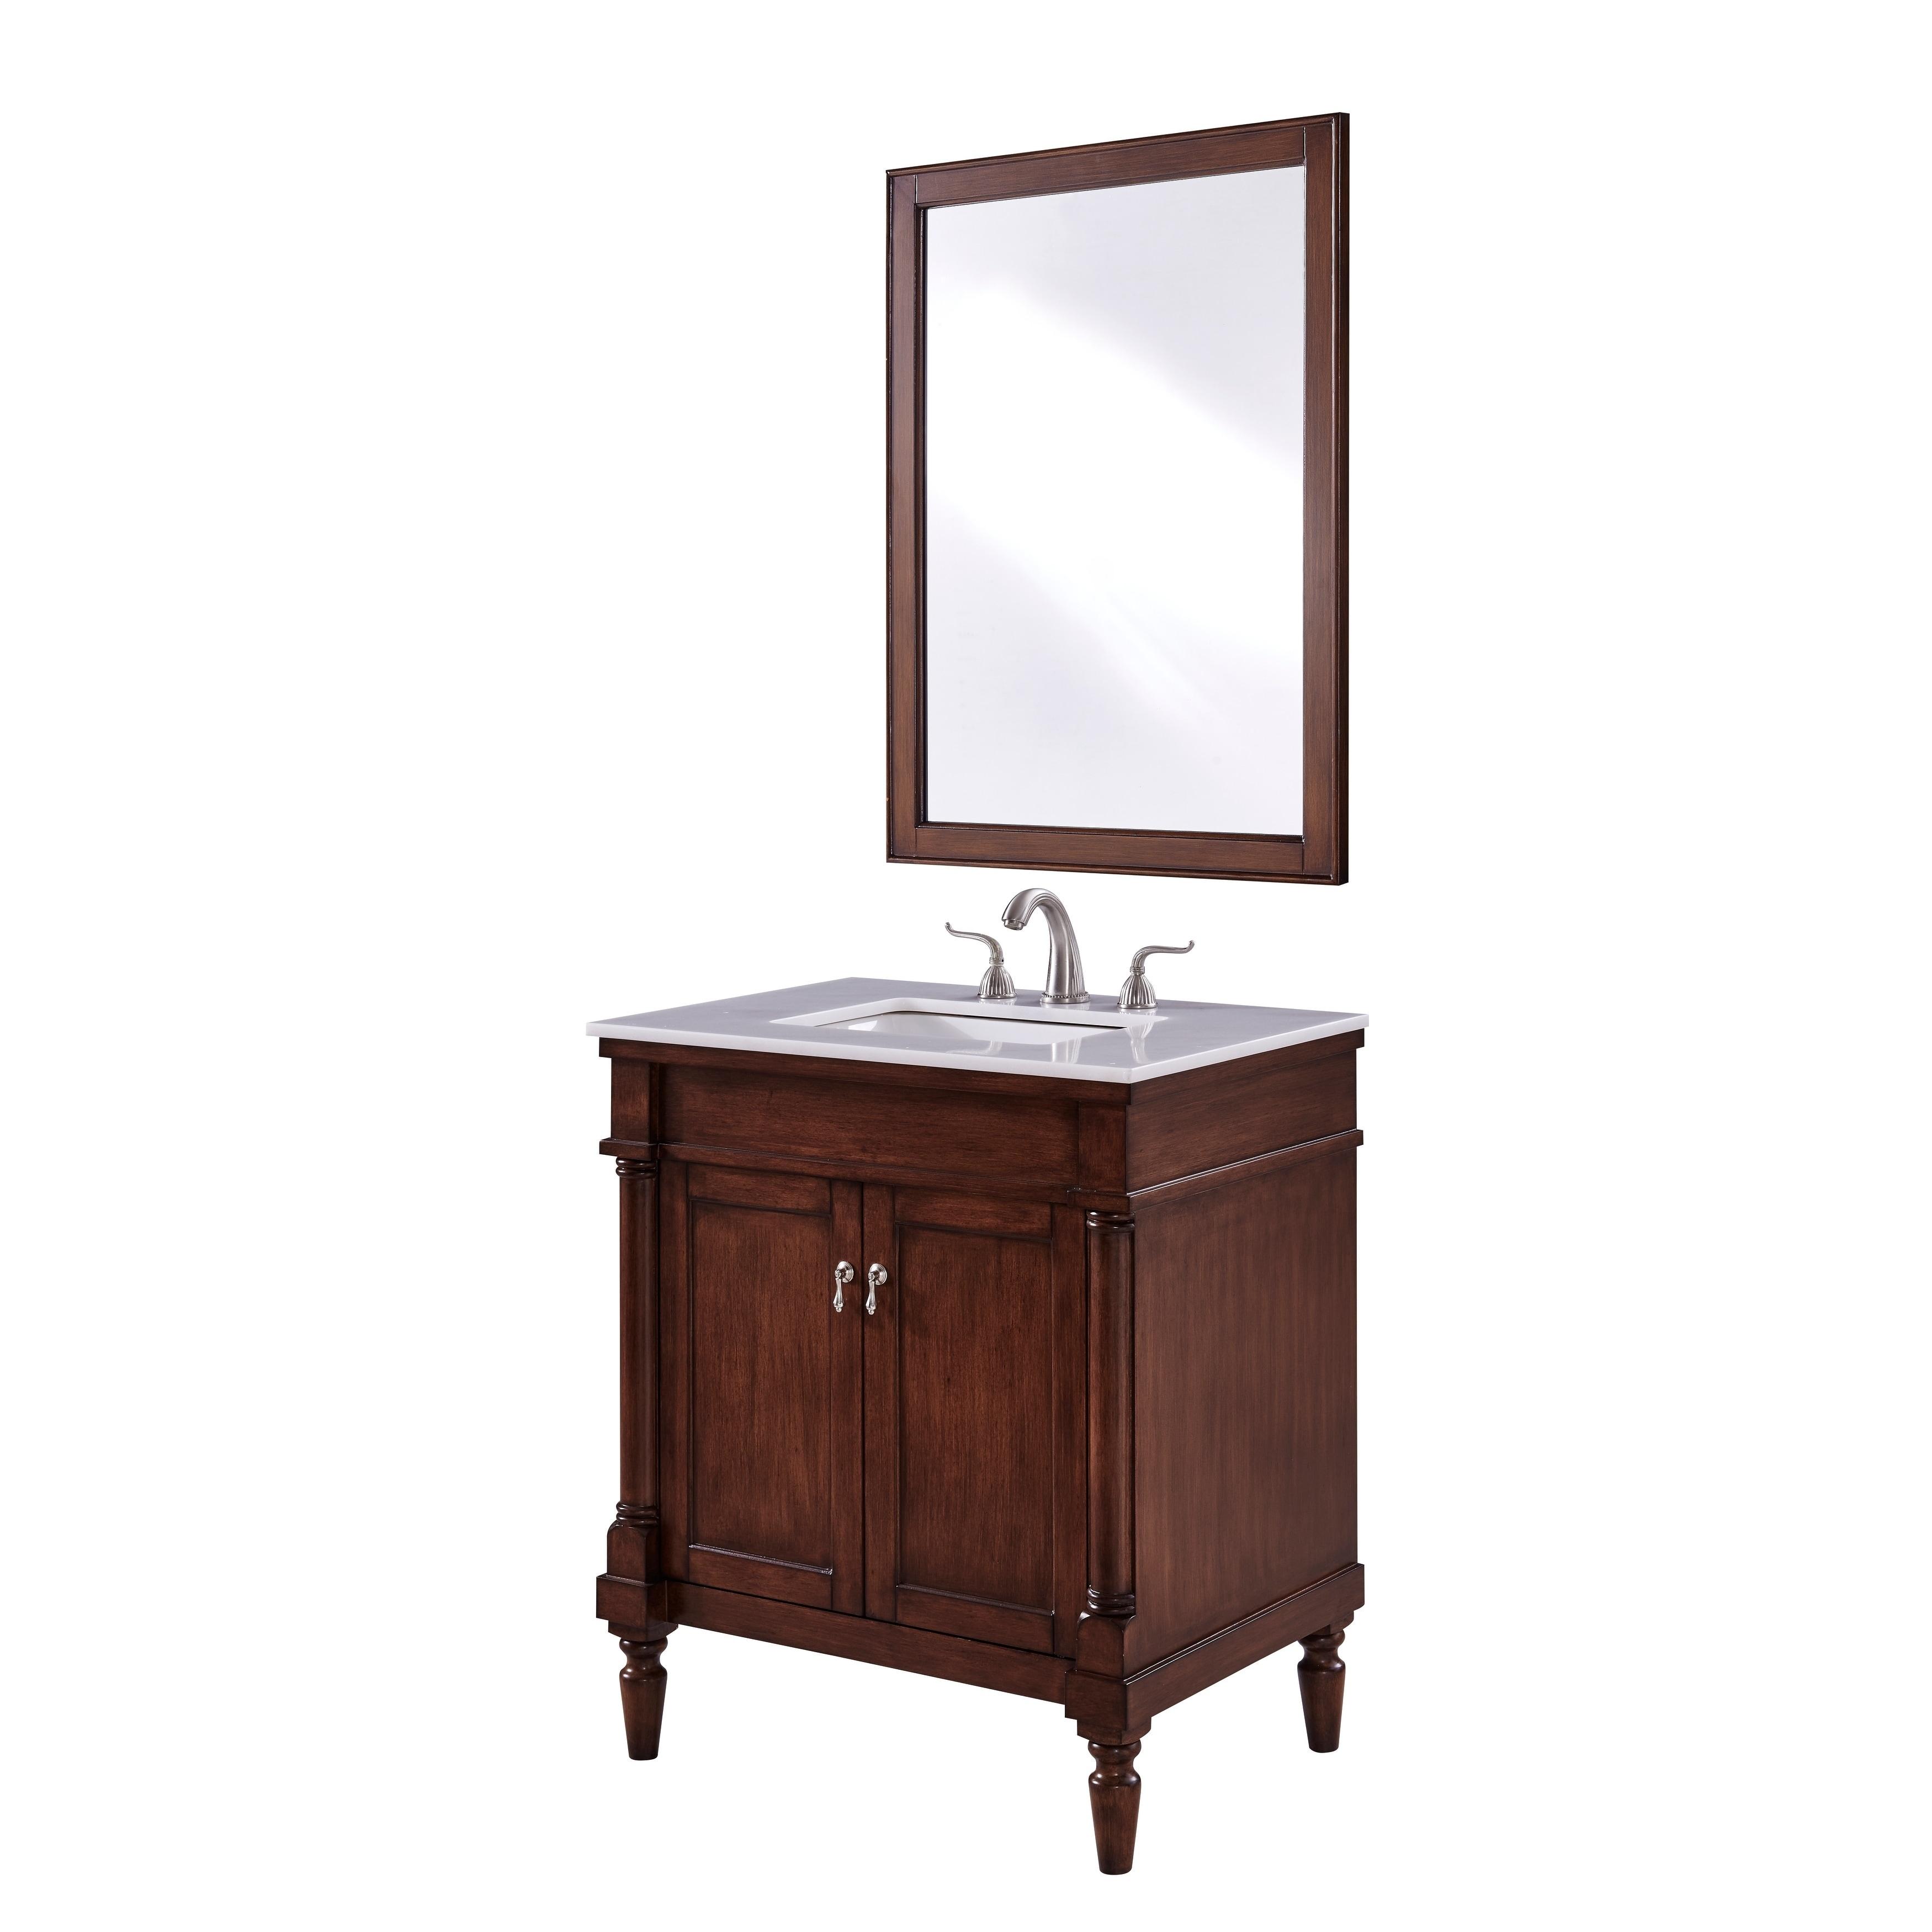 Bathroom Walnut Finish Single Vanity - Free Shipping Today ...